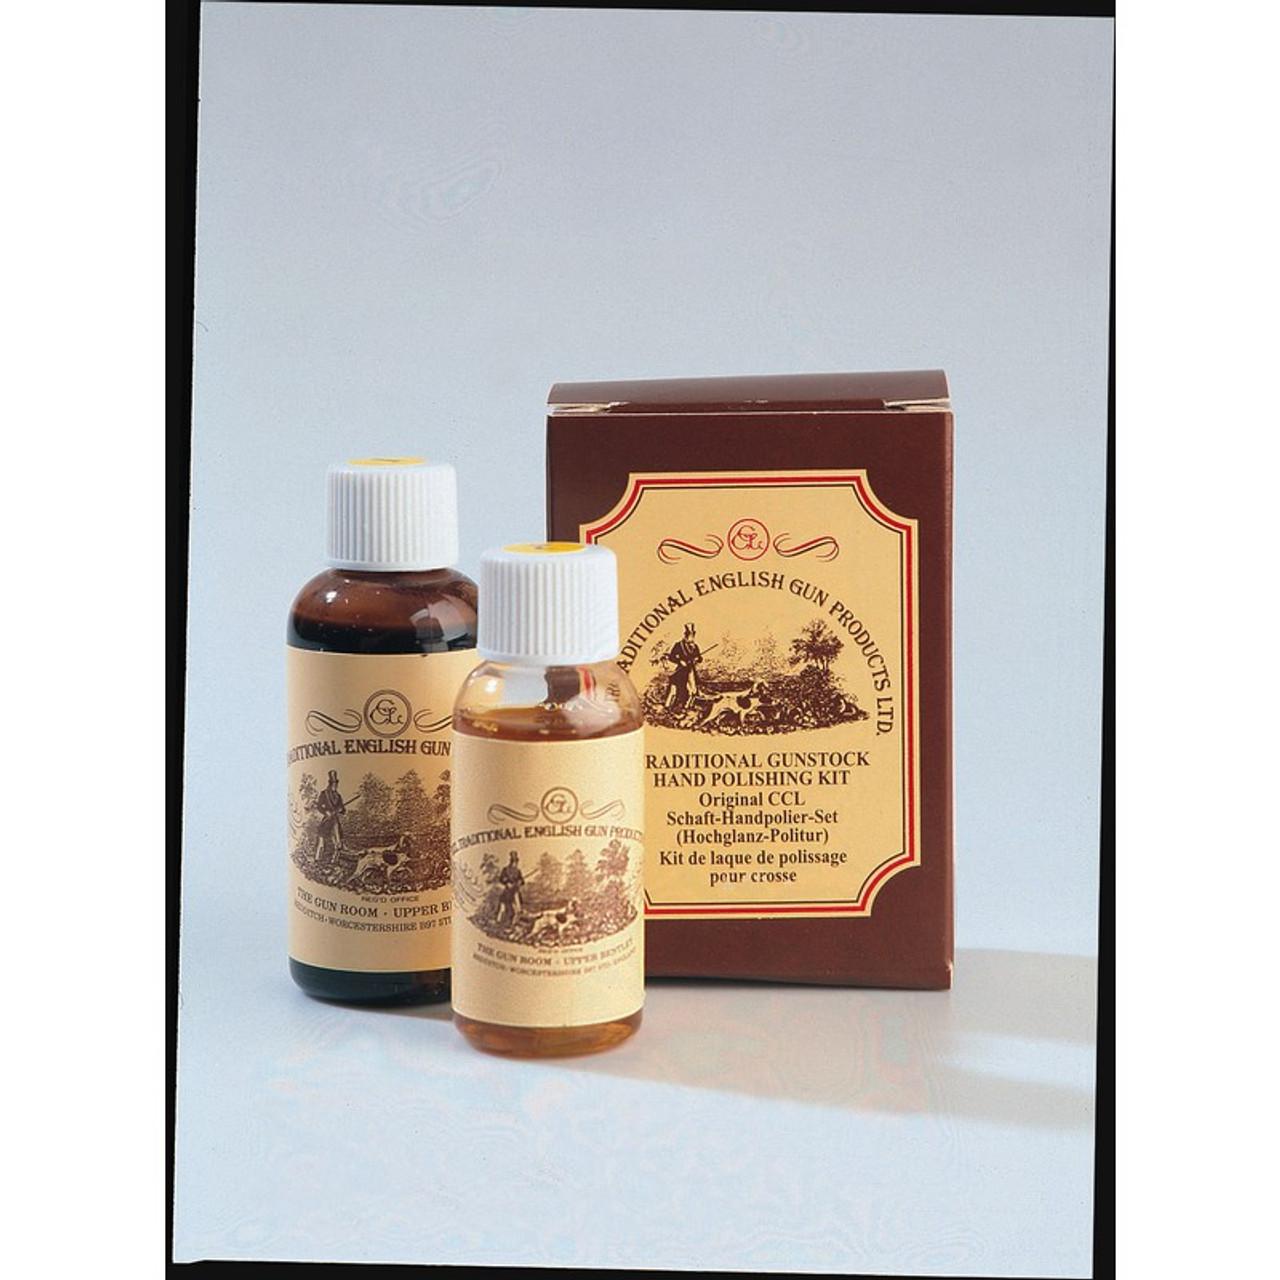 Best price for CCL Hand Polishing Kit, on sale from Bradford Stalker